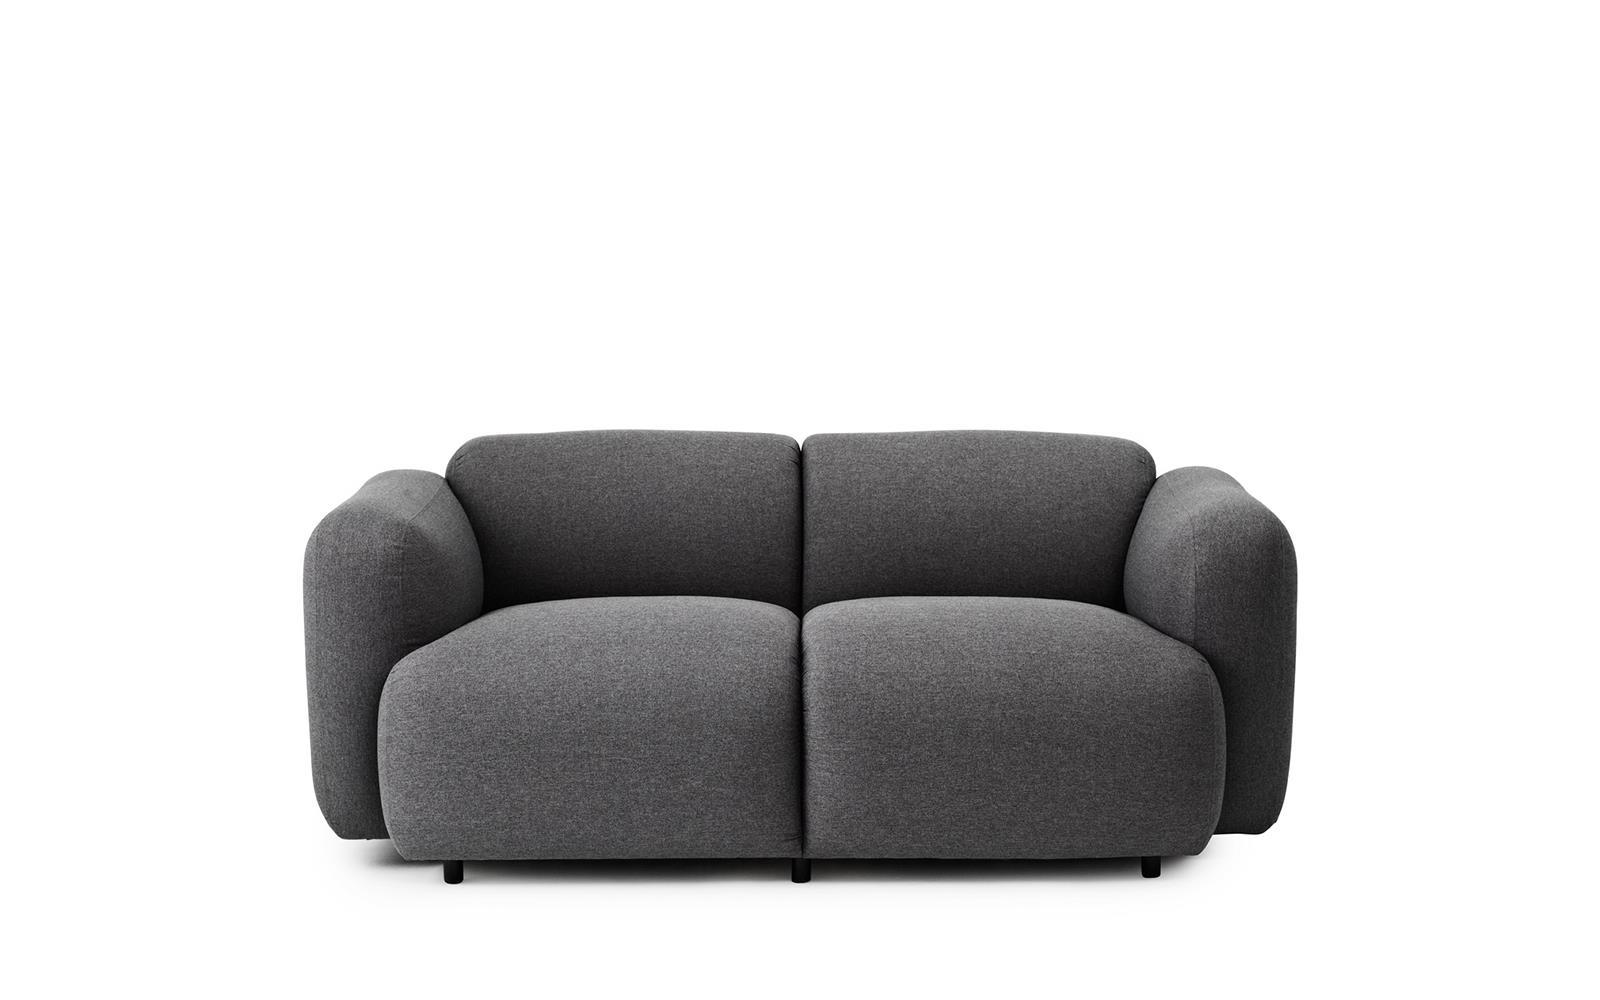 Wondrous Swell Sofa 2 Seater Breeze Fusion Machost Co Dining Chair Design Ideas Machostcouk